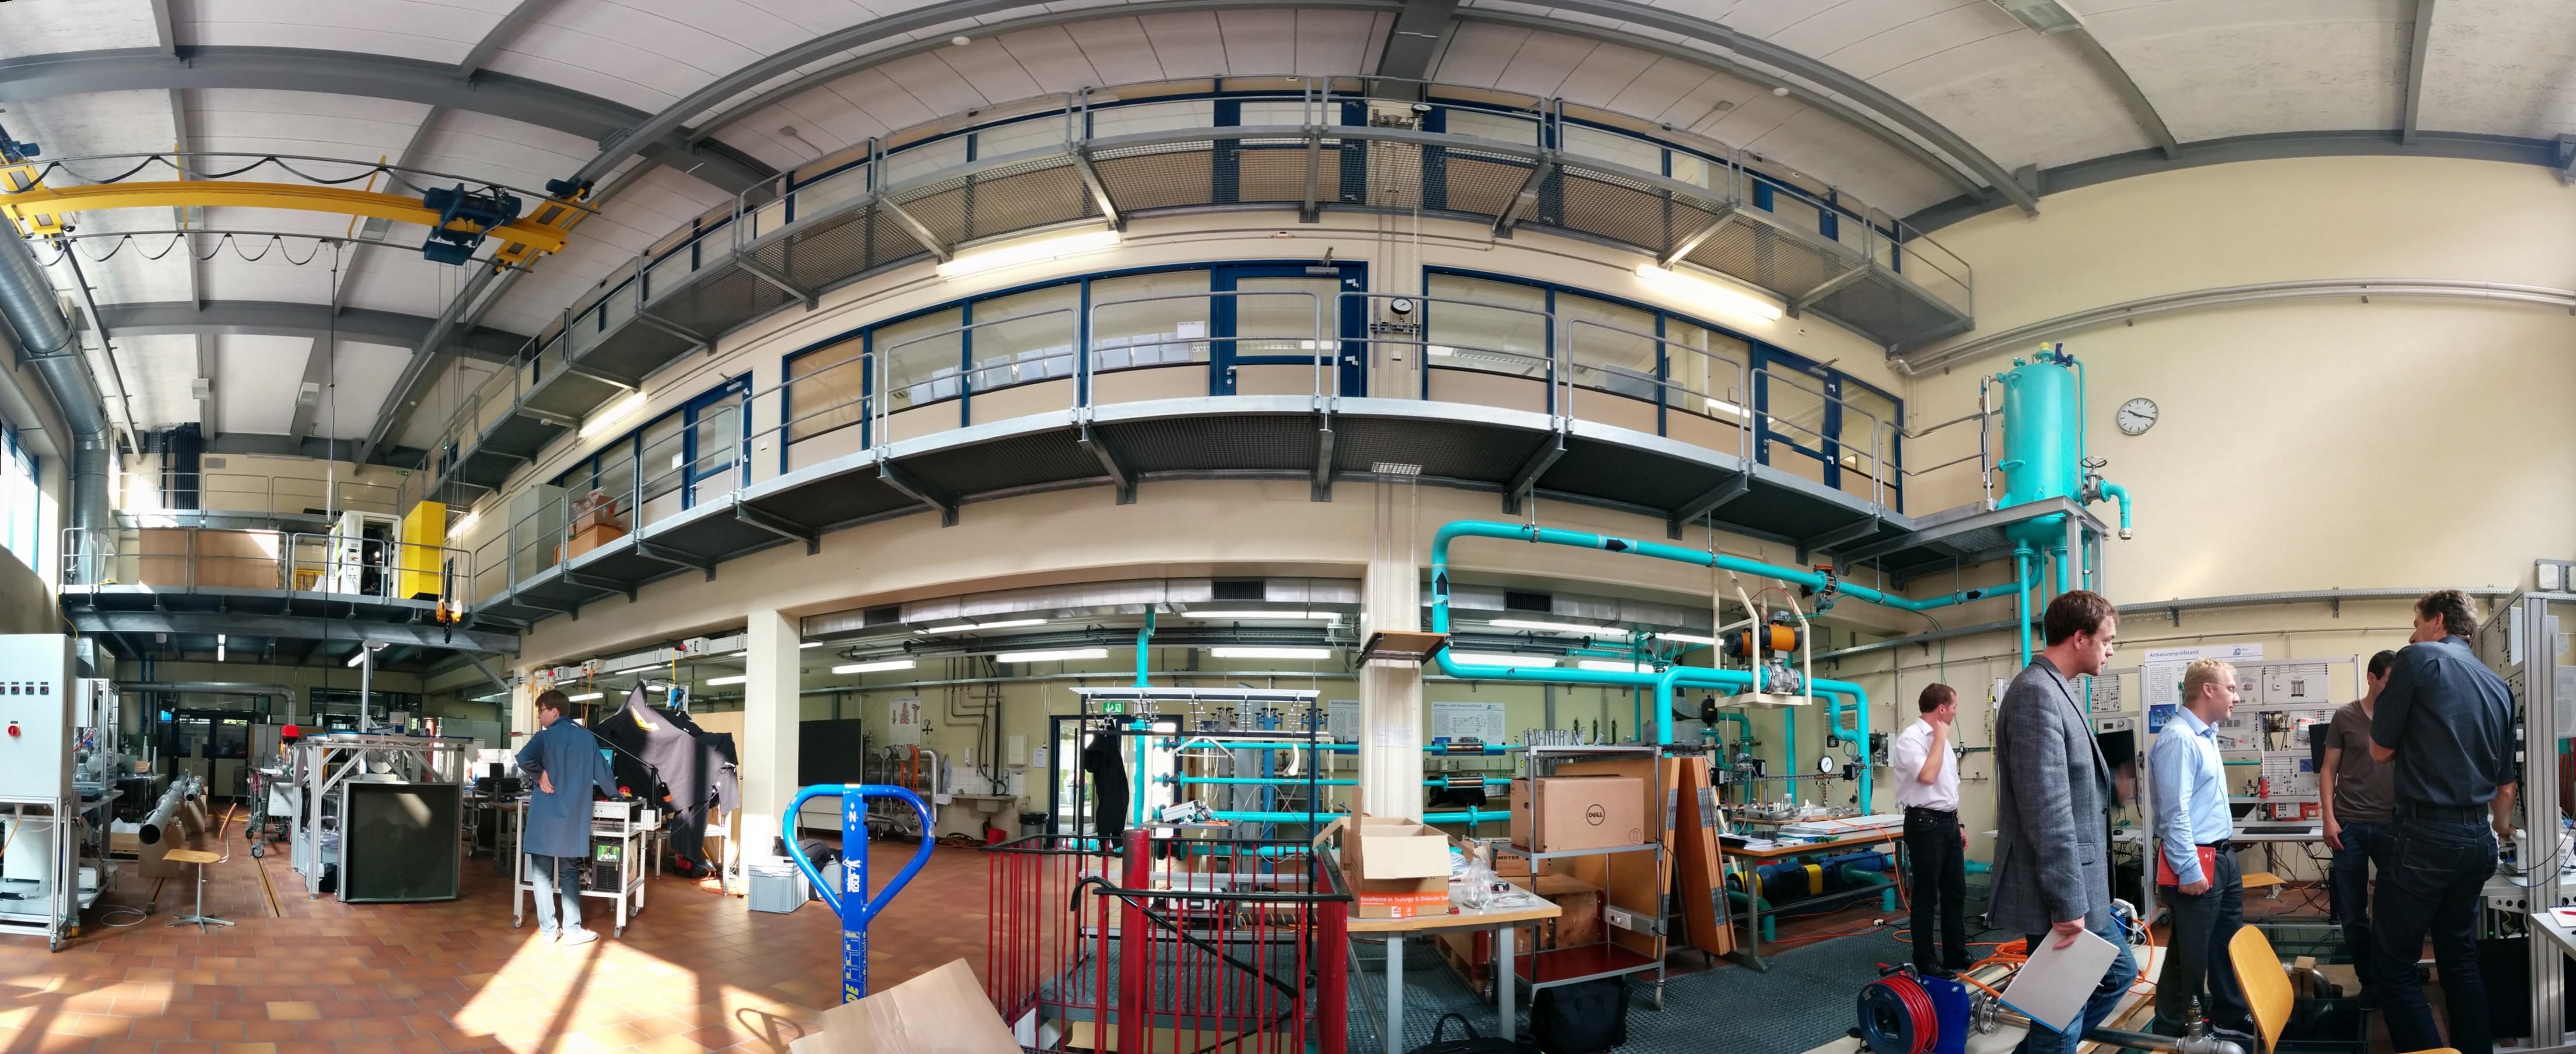 Inbetriebnahme im Maschinenbaulabor